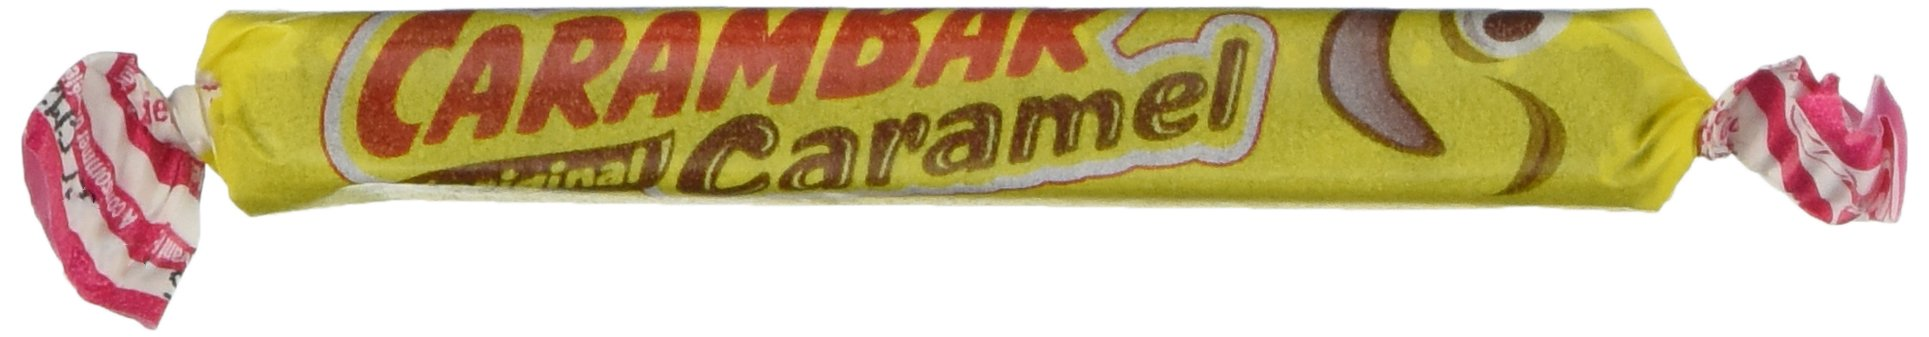 Carambar Caramel Candy - 200 Piece Case - Save 20% by La Pie qui Chante